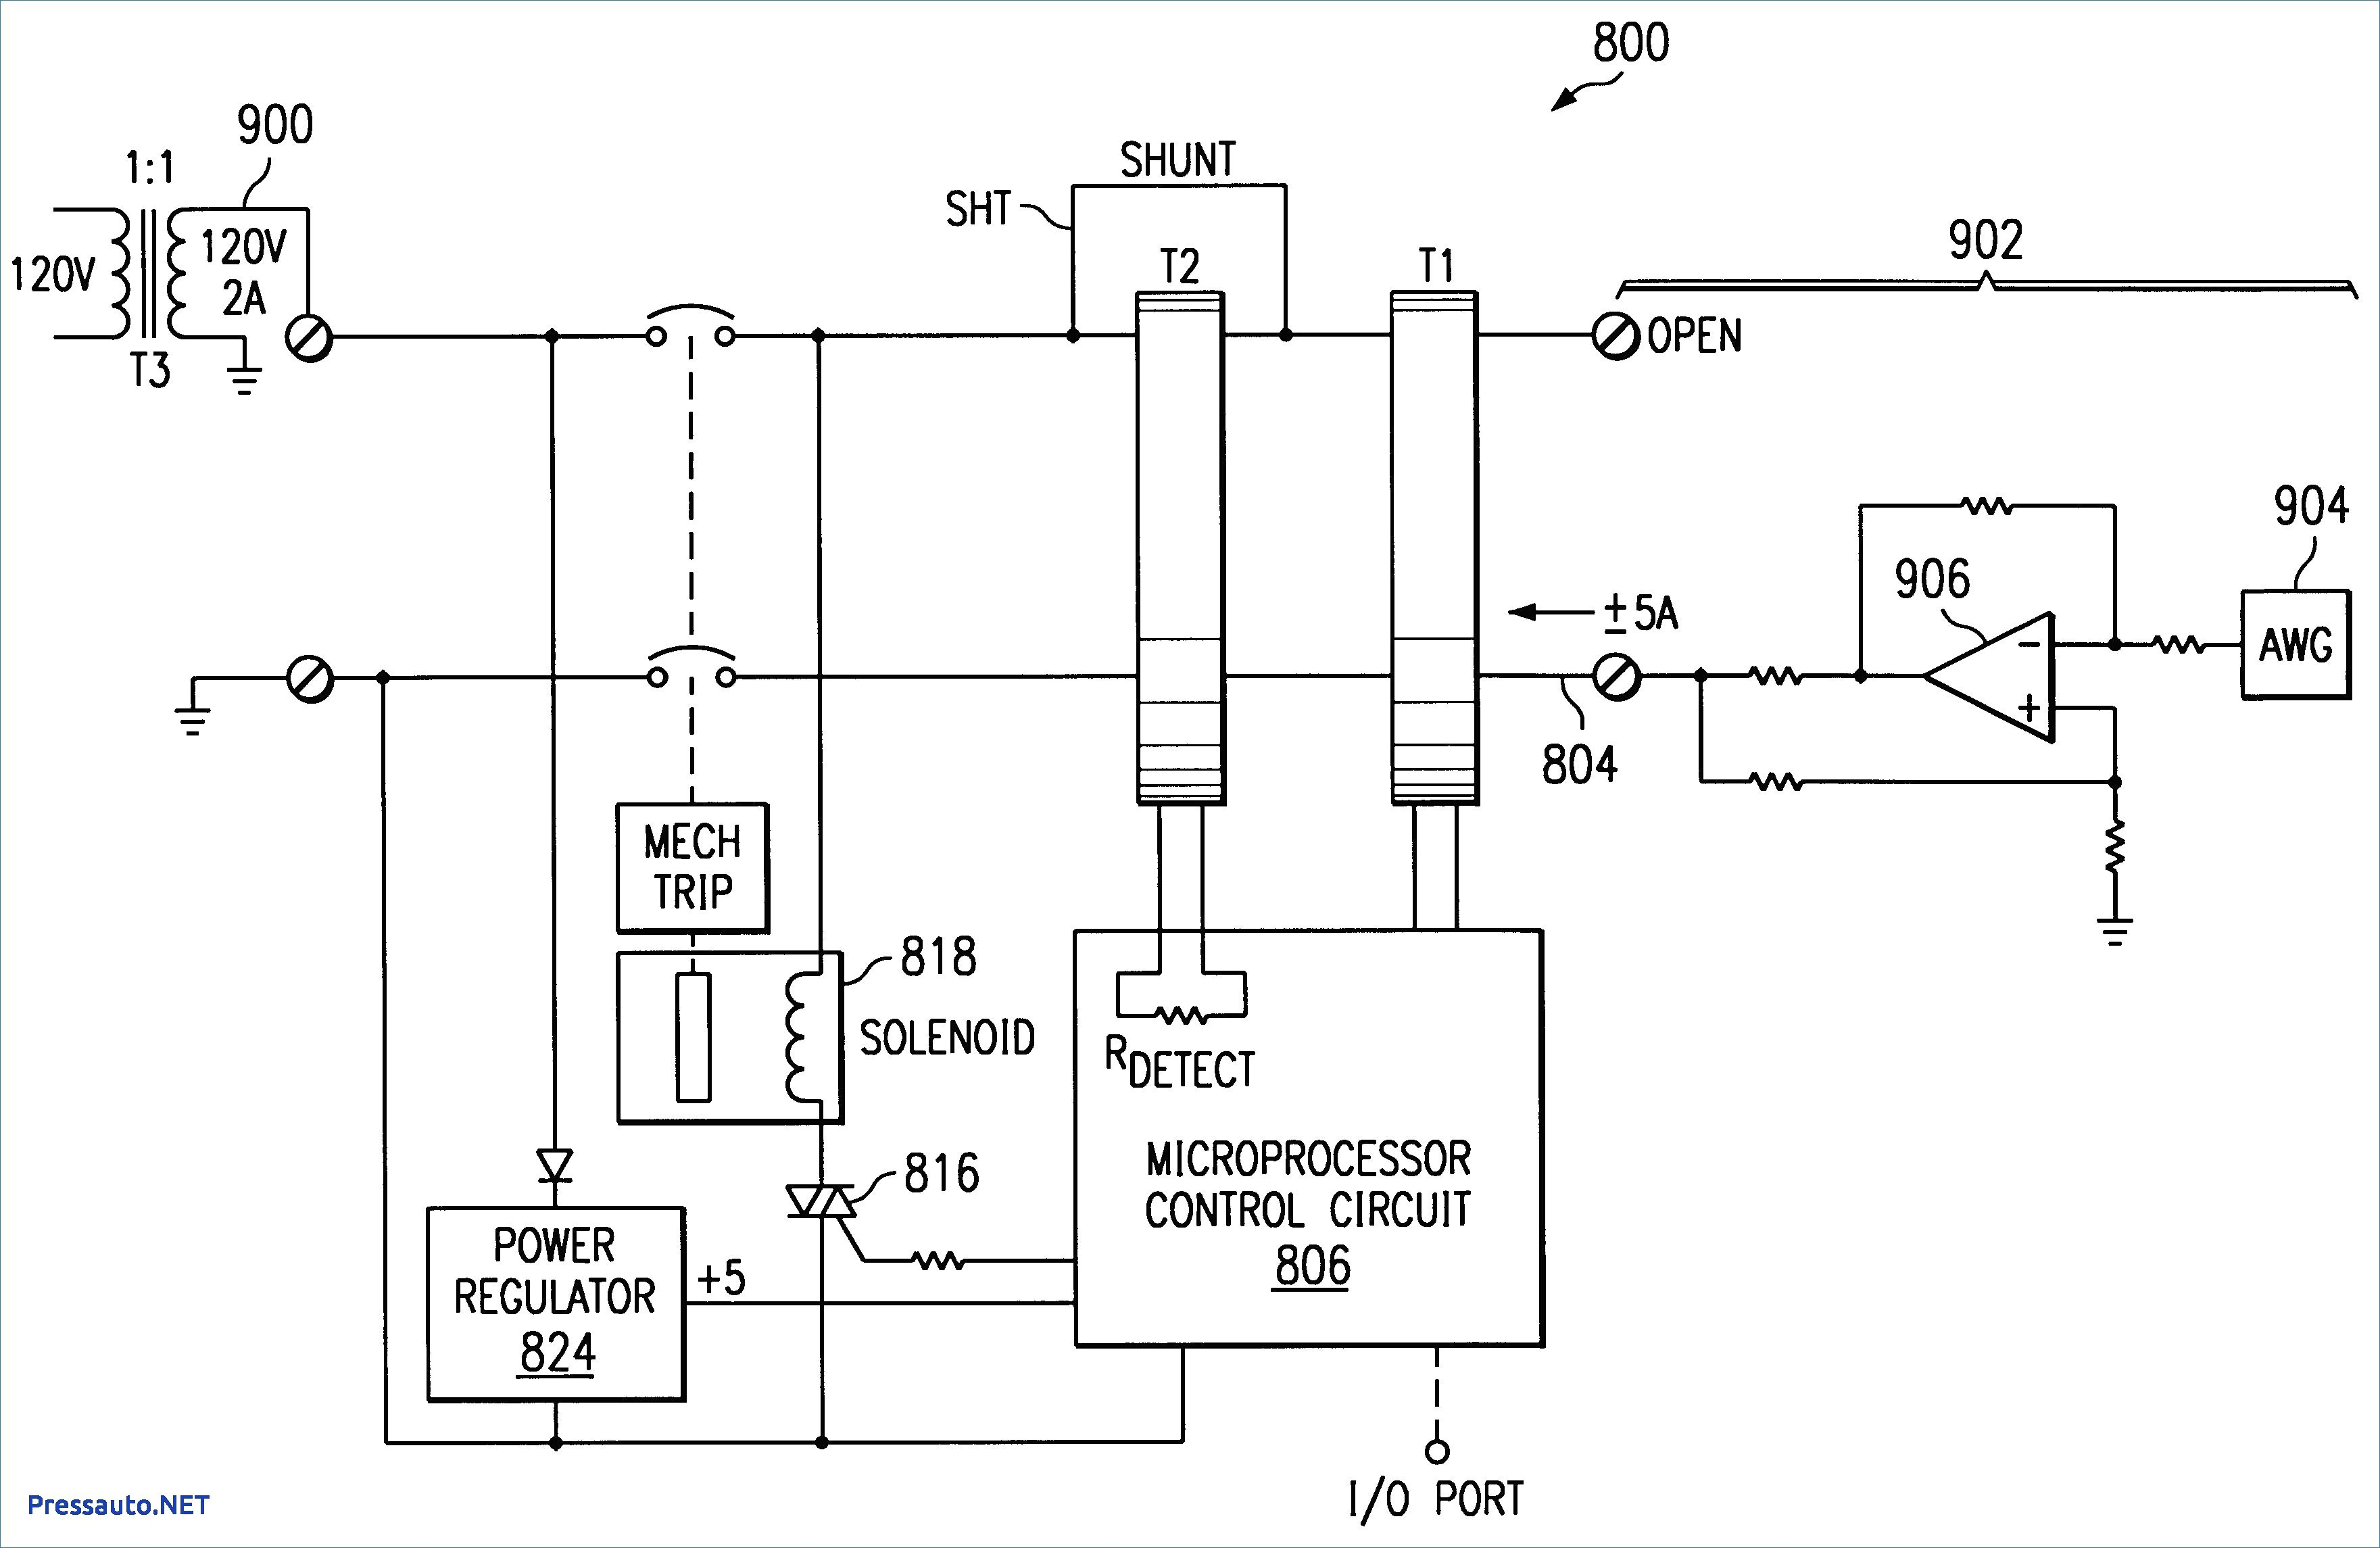 Square D Shunt Trip Breaker Wiring Diagram Wiring Diagram 2 Pole Gfci Breaker Fresh Circuit Breaker Diagram Of Square D Shunt Trip Breaker Wiring Diagram